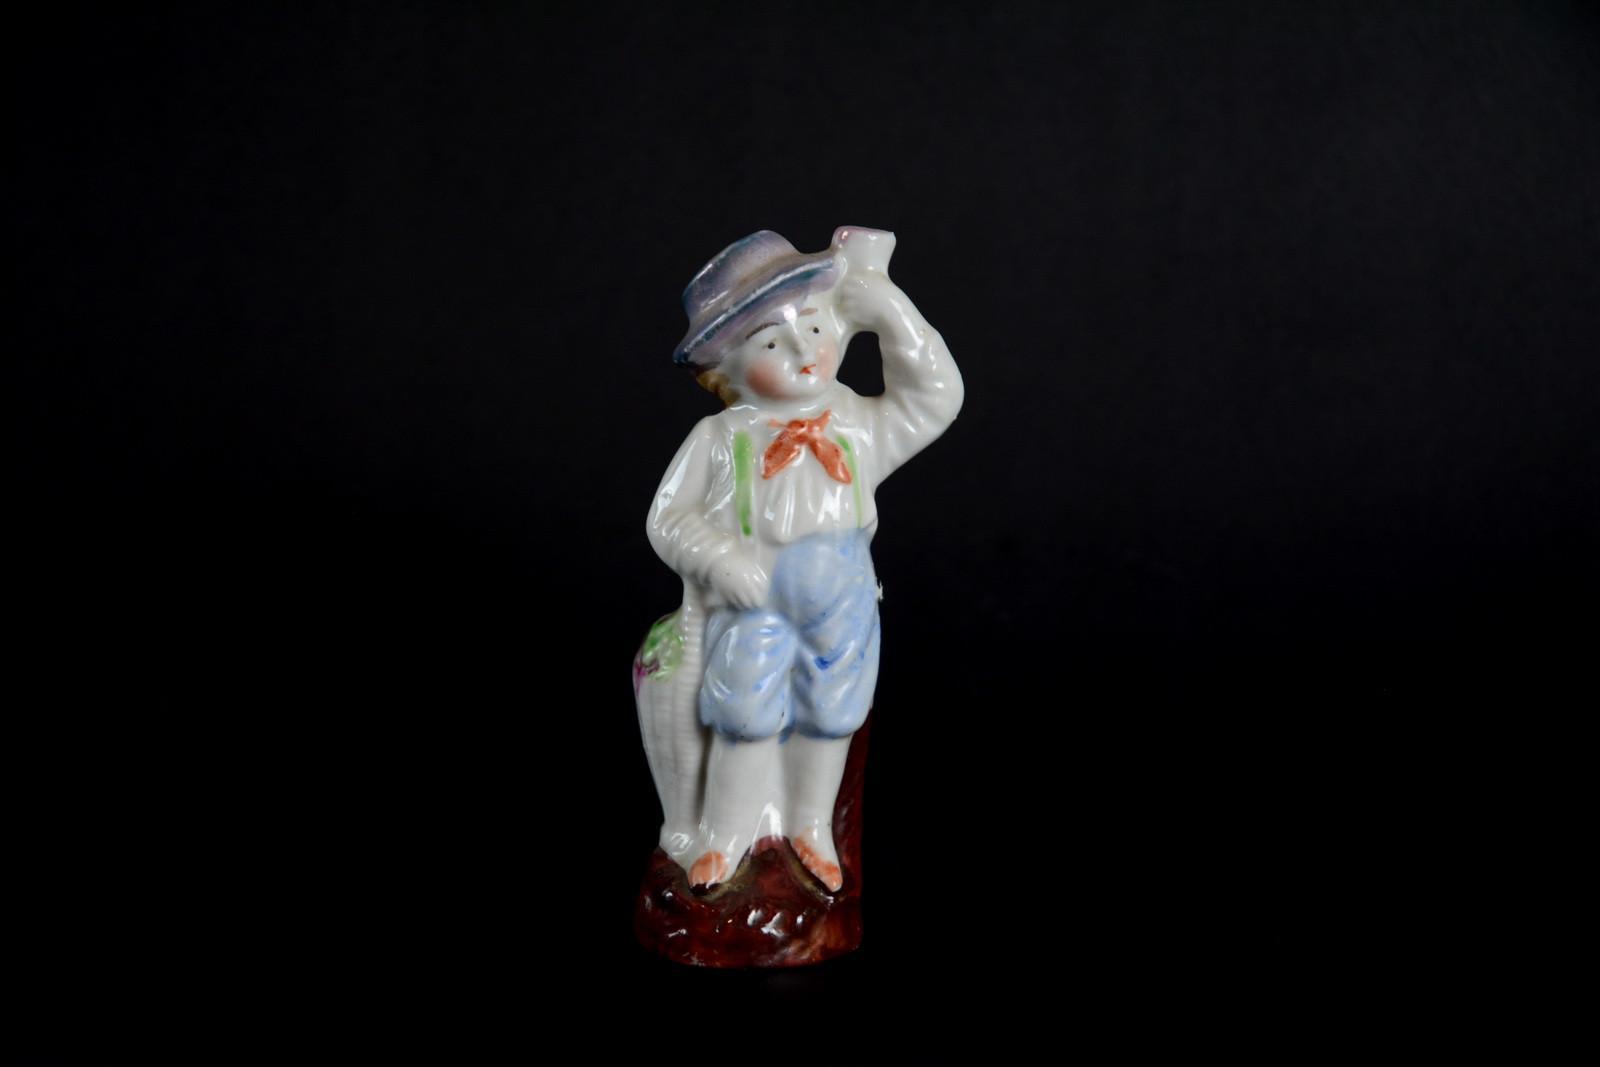 statuetta-in-ceramica-ragazzo-tirolese,2378.jpg?WebbinsCacheCounter=1